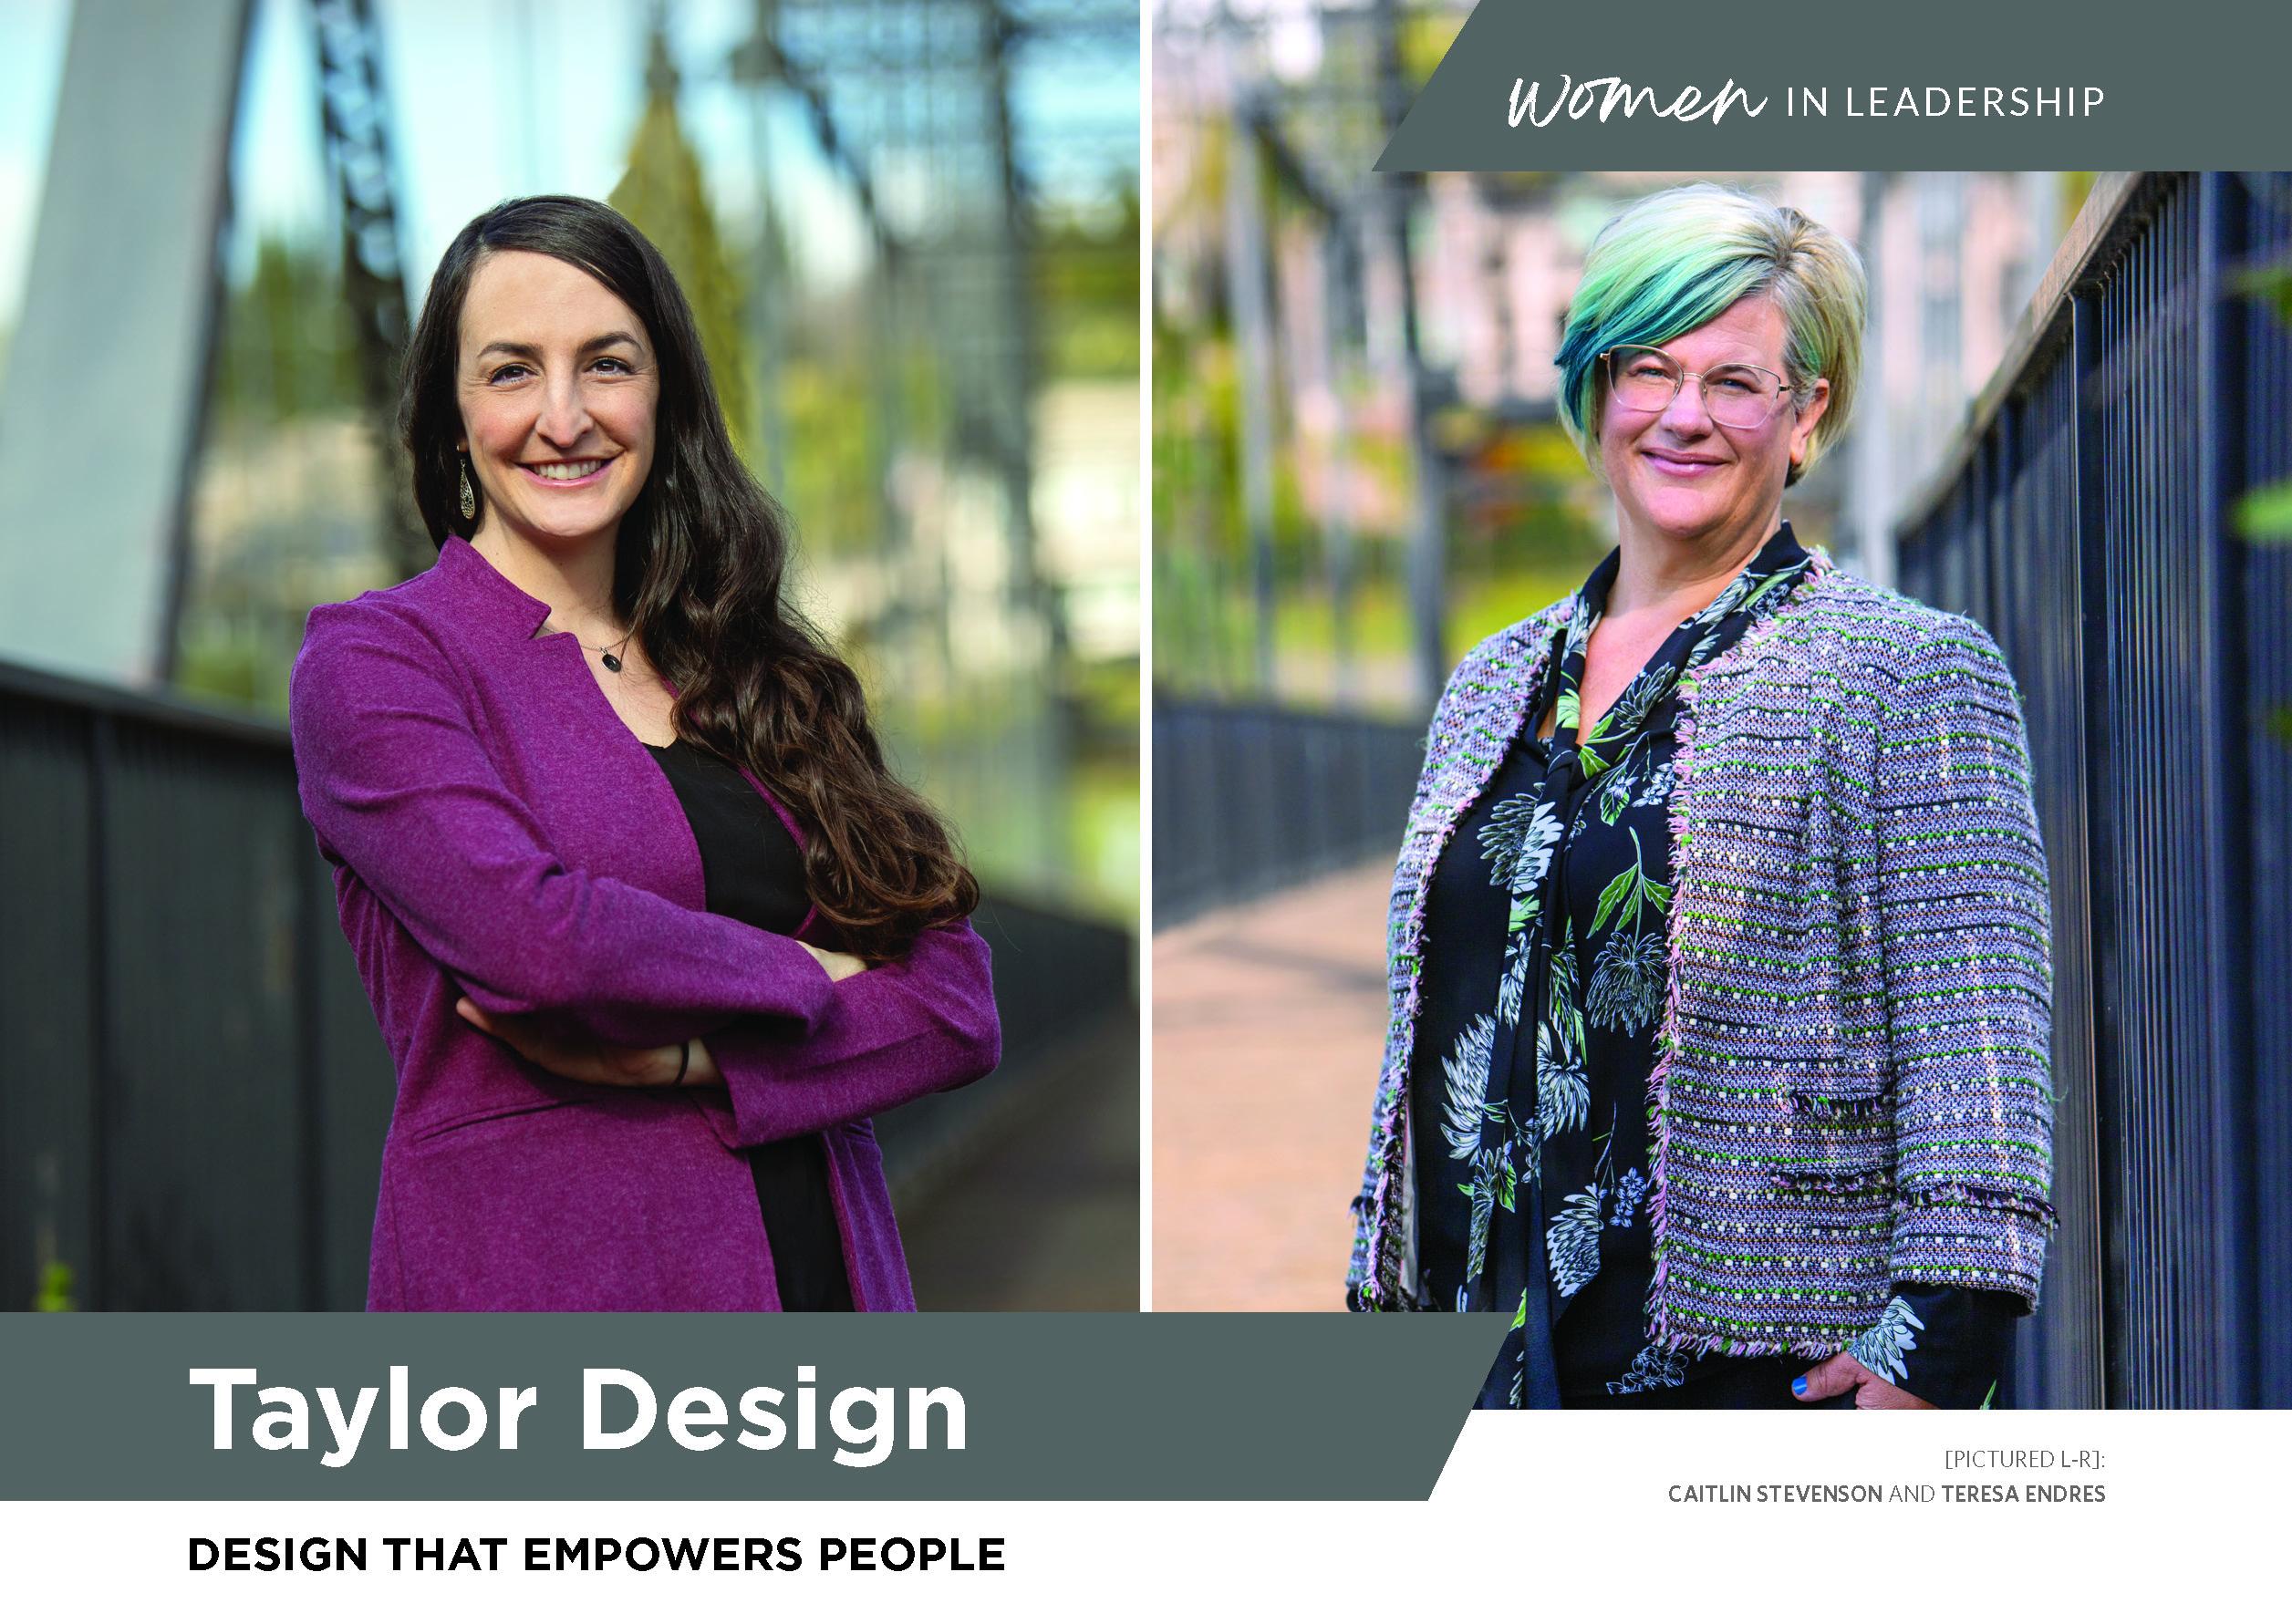 Taylor Design - Women in Leadership